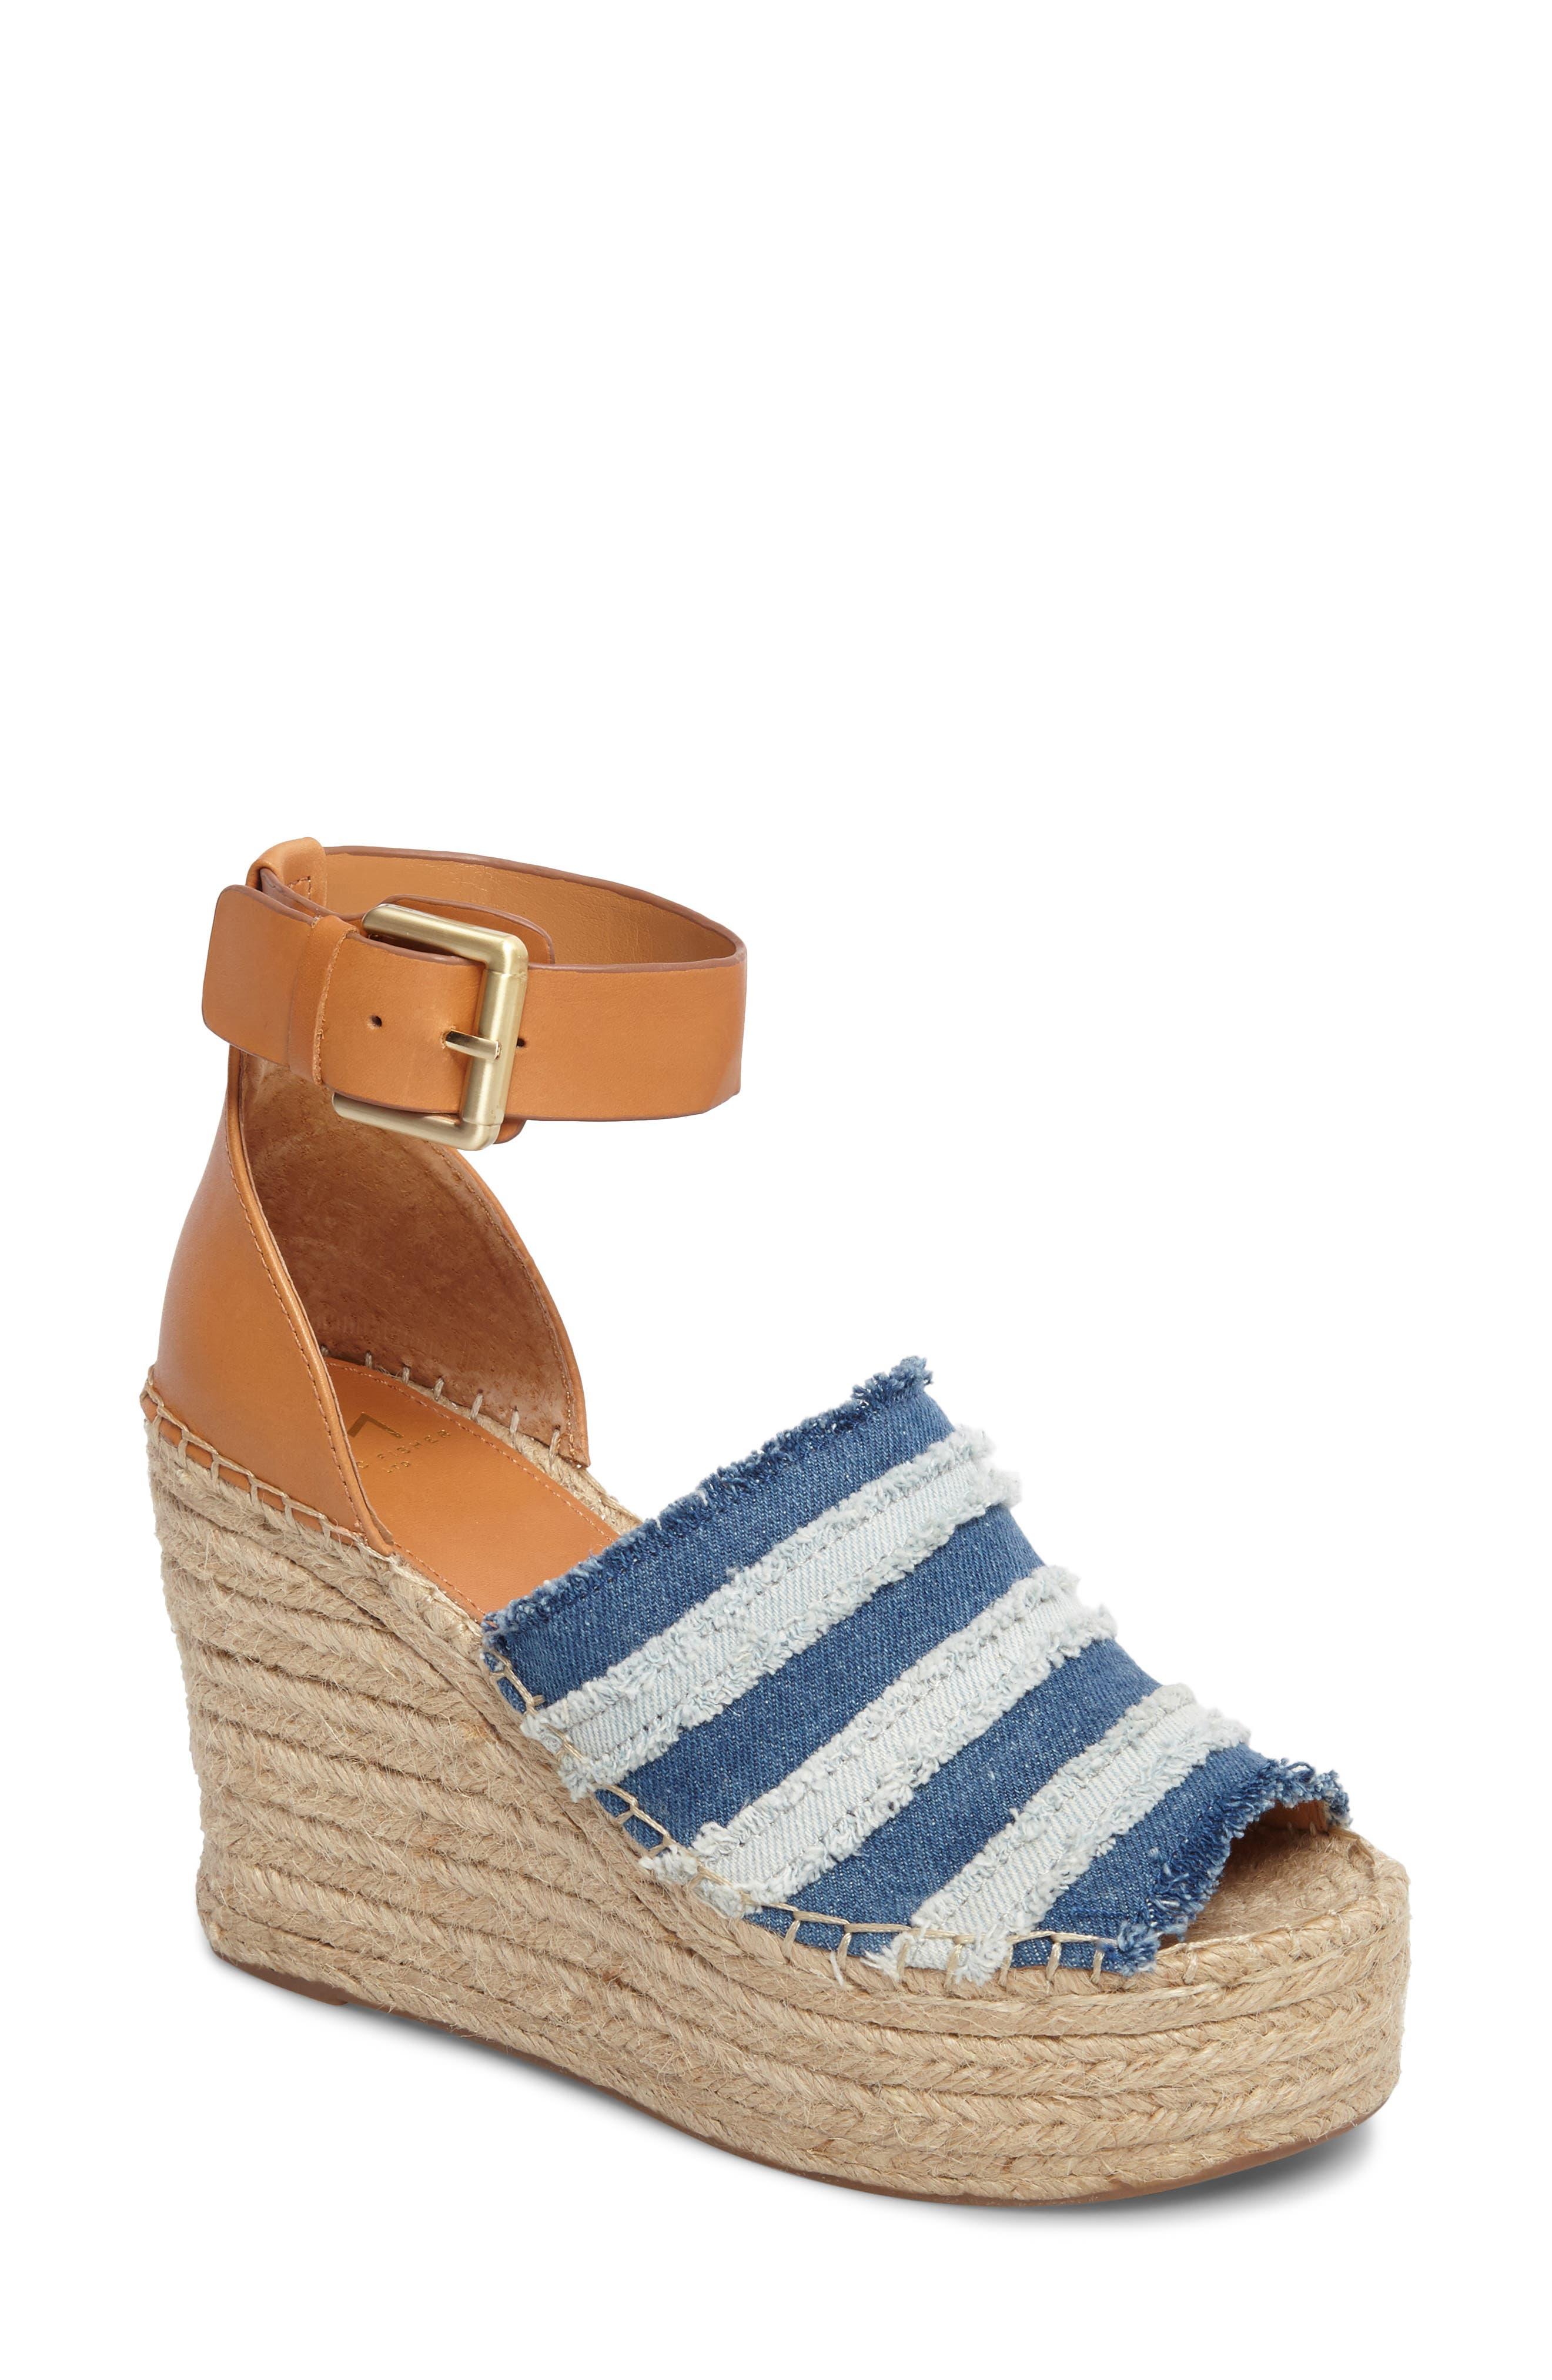 Adria Wedge Sandal,                             Main thumbnail 1, color,